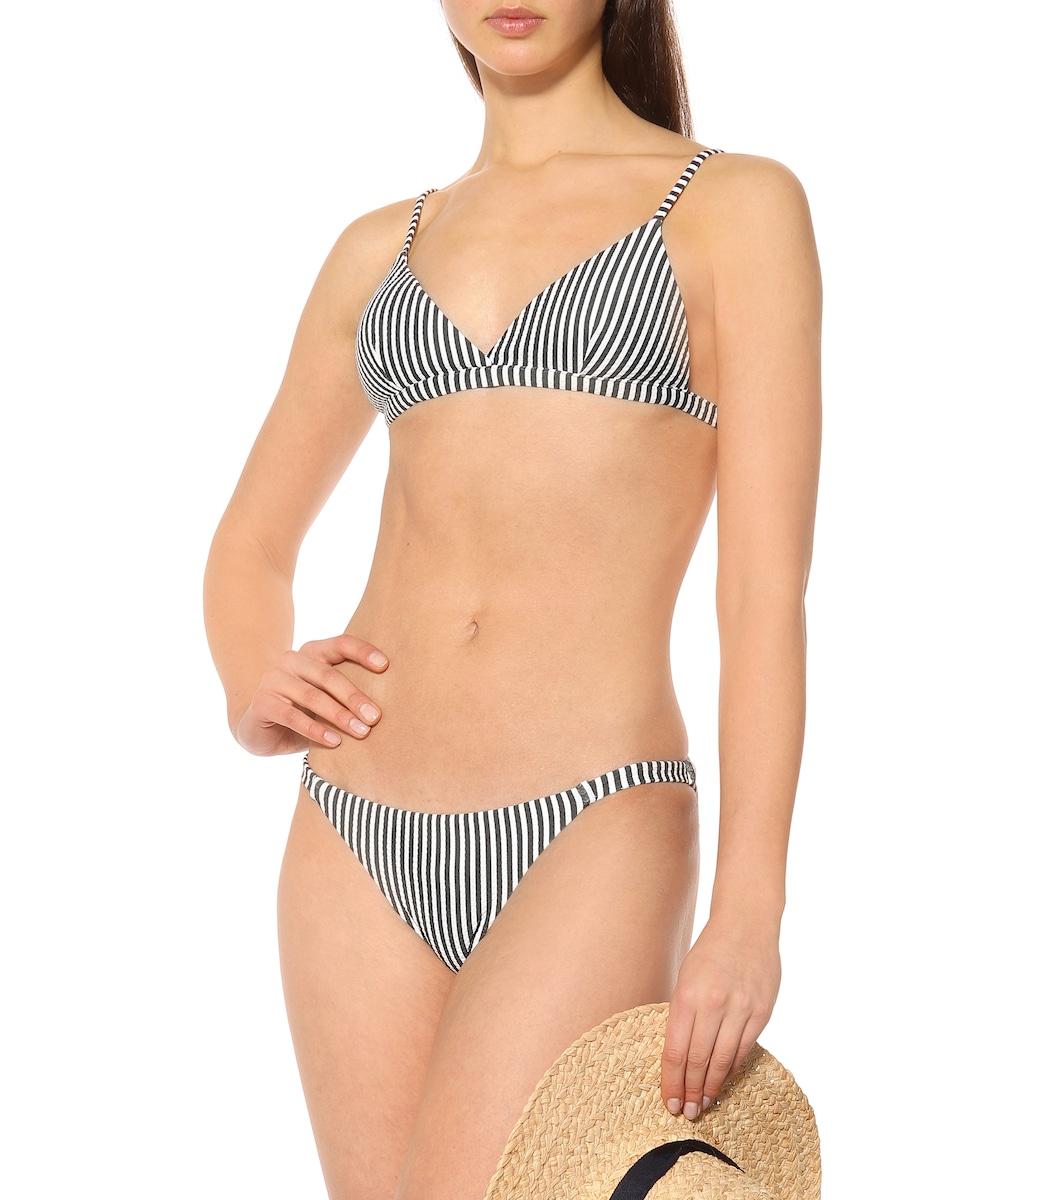 816bd5341f5ce Striped Bikini Bottoms - Asceno | mytheresa